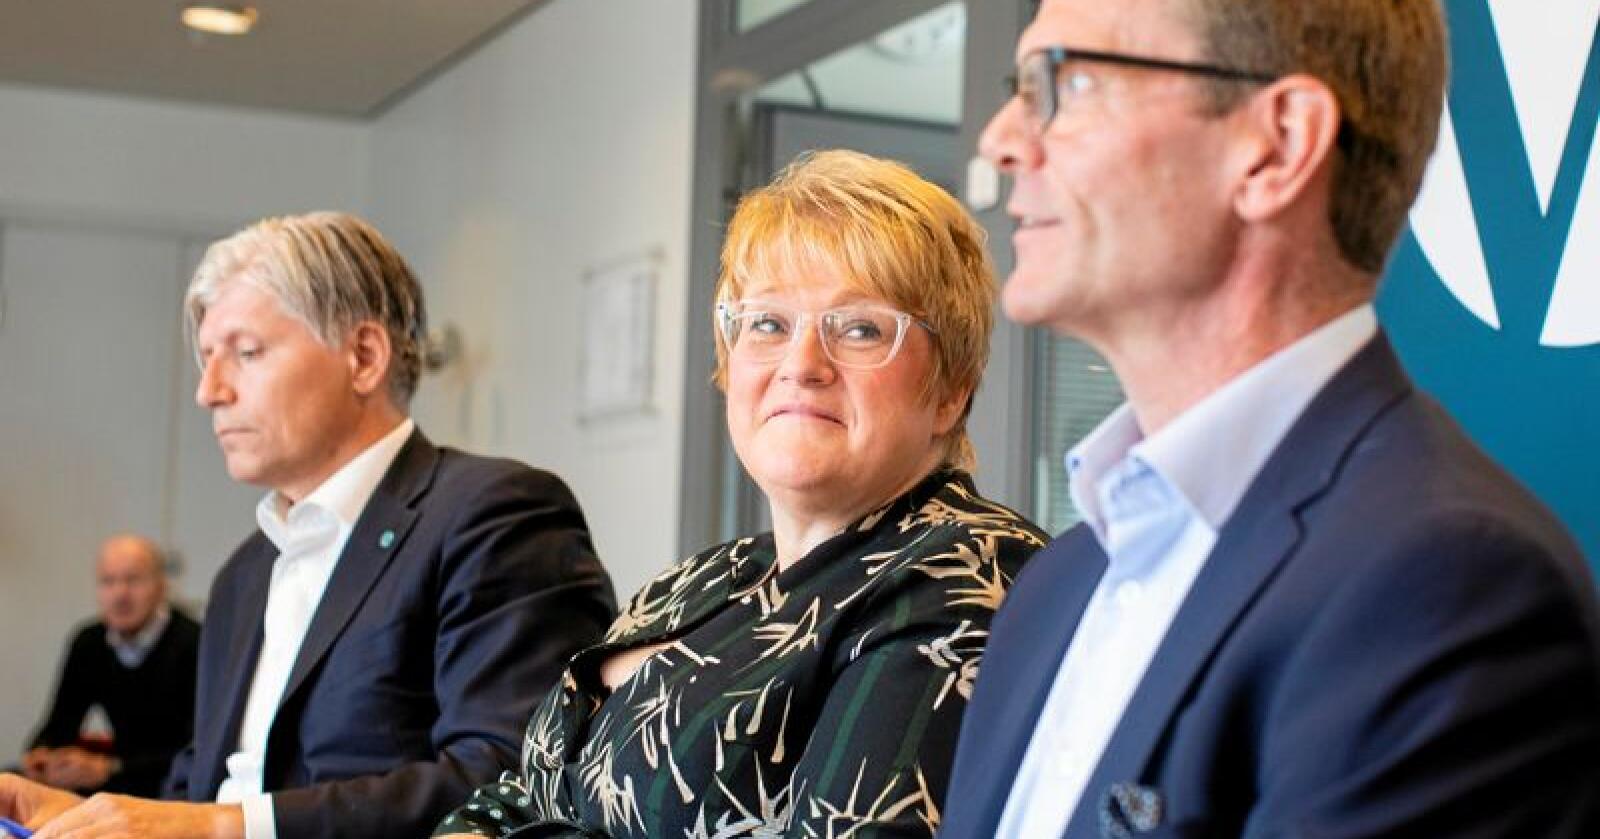 Nestleder Terje Breivik (t.h.) understreker at målingen er altfor dårlig for Venstre. Her er han sammen med partileder Trine Skei Grande og nestleder Ola Elvestuen.  Foto: Tore Meek / NTB scanpix